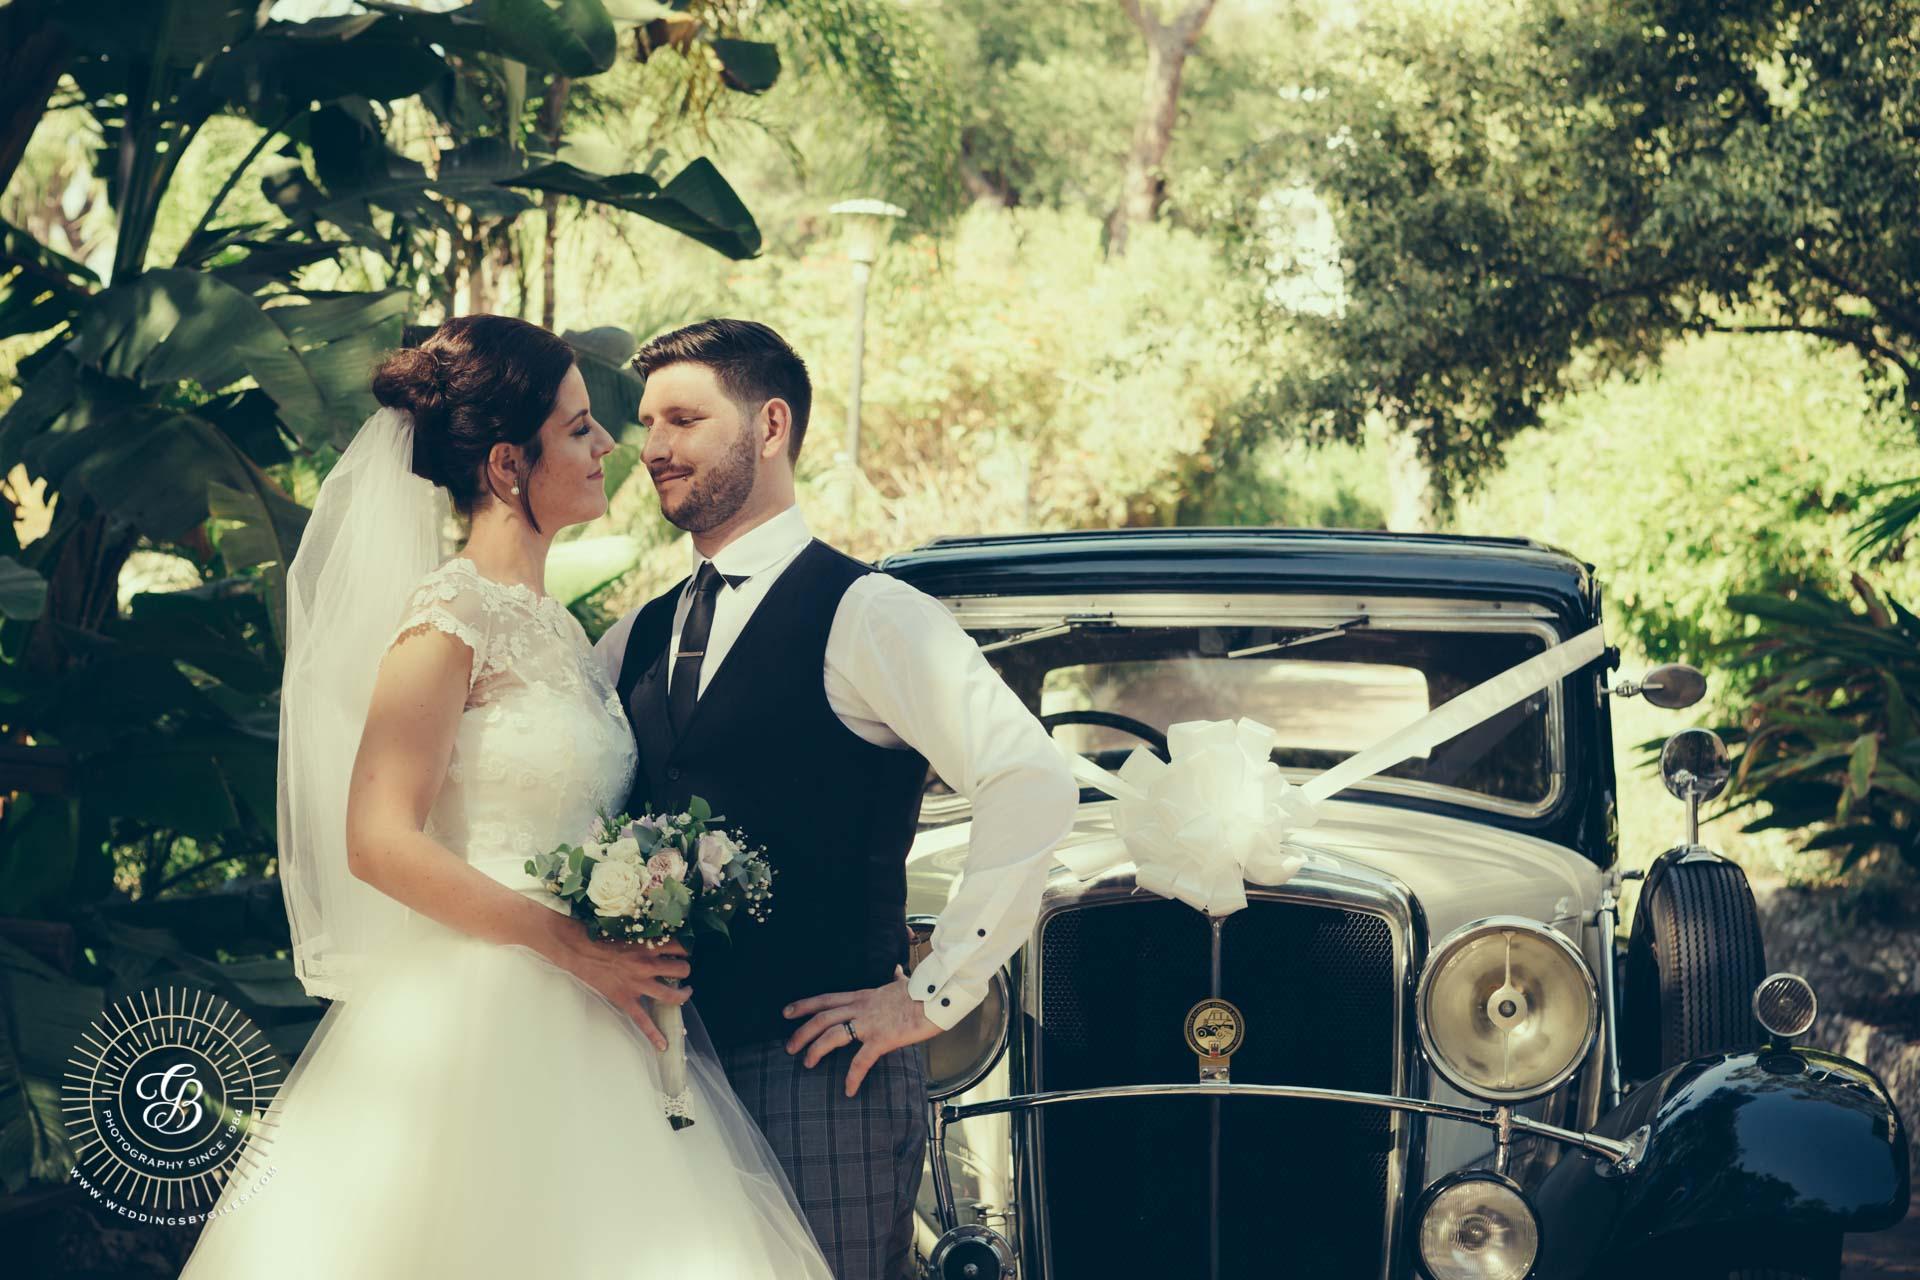 newlyweds and vintage wedding car